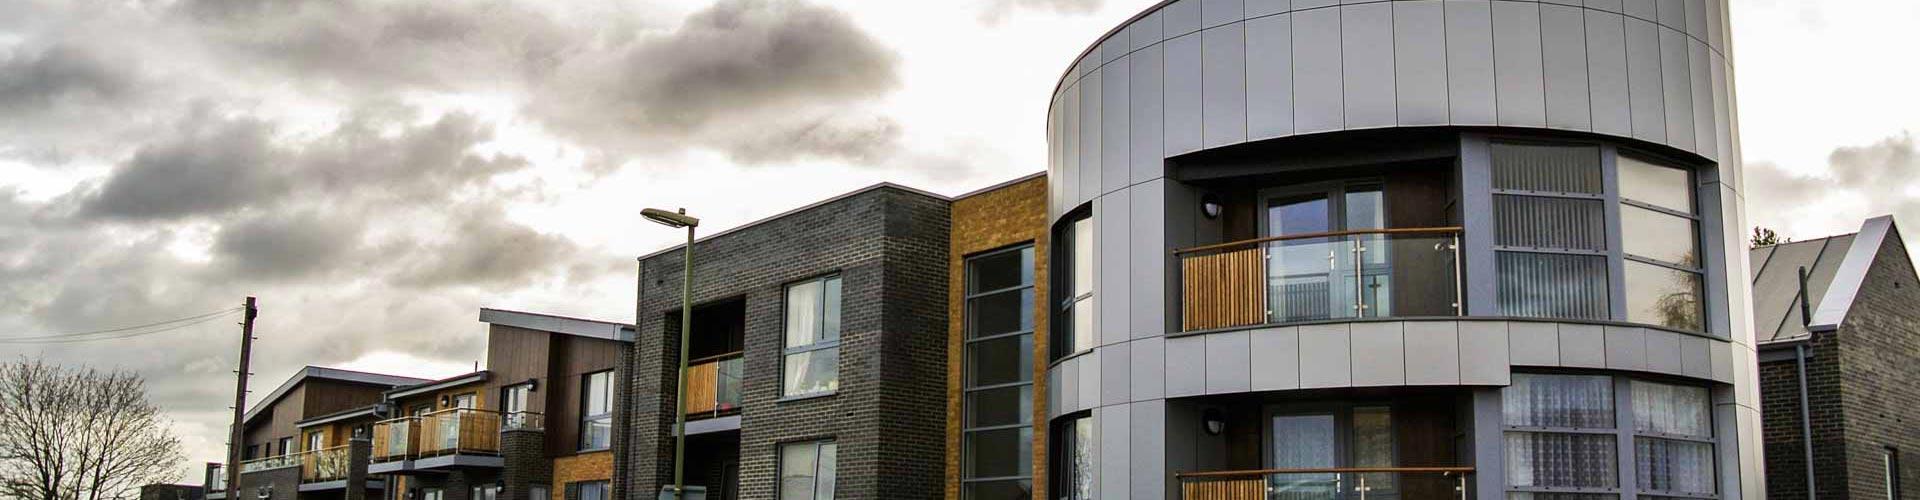 Collingwood Court, T&T Carpentry & Facades Slide